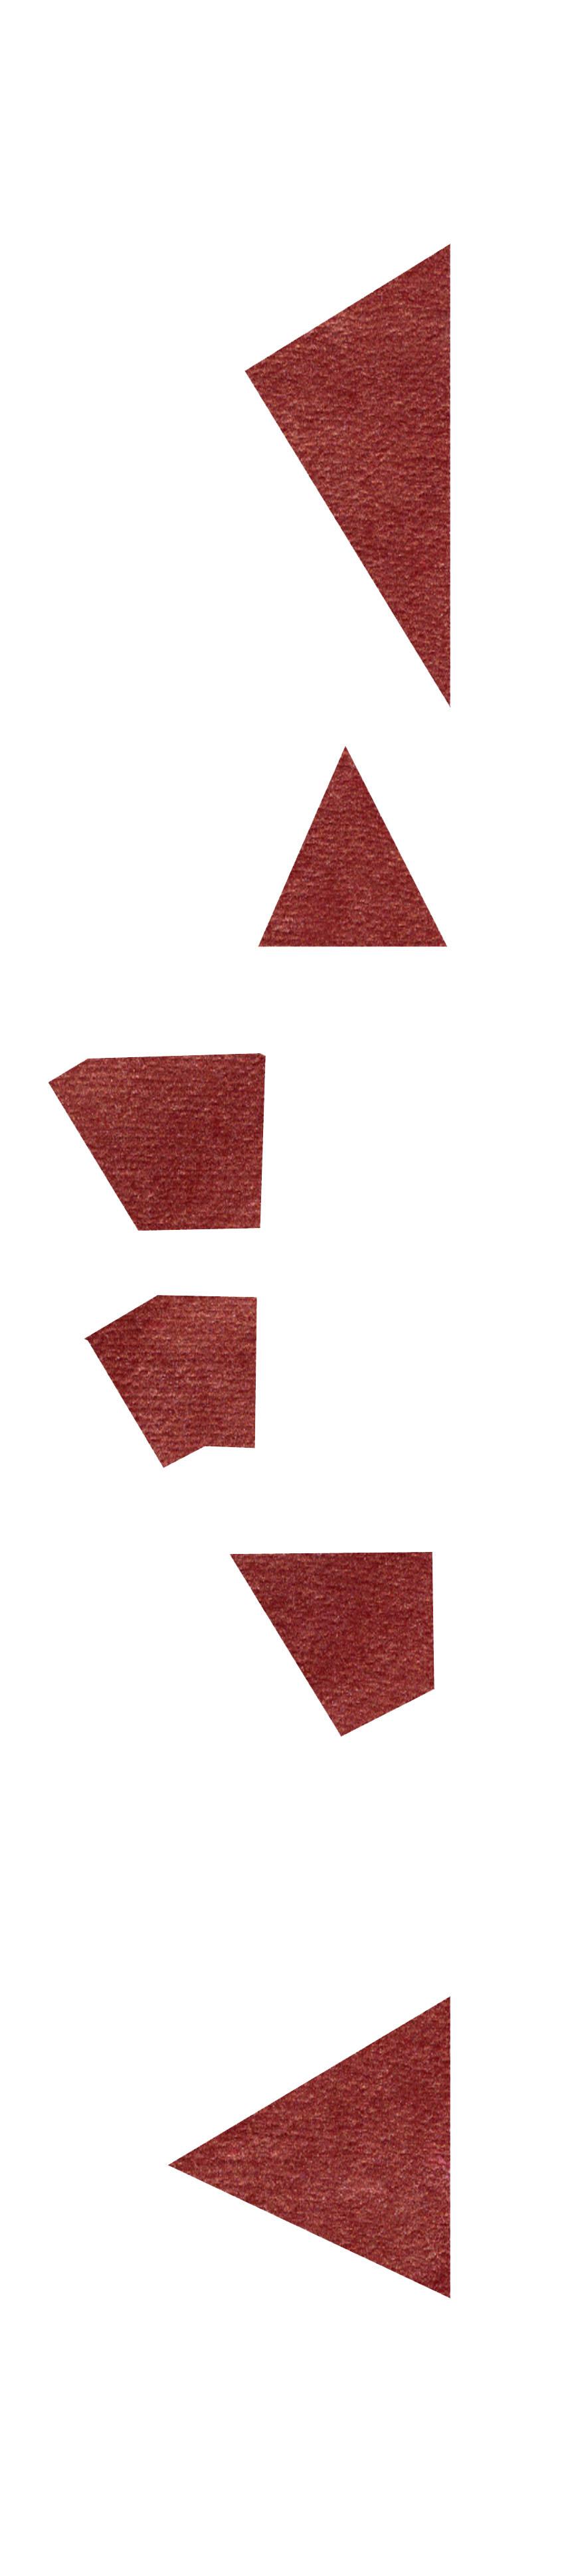 L_pieces copy.jpg